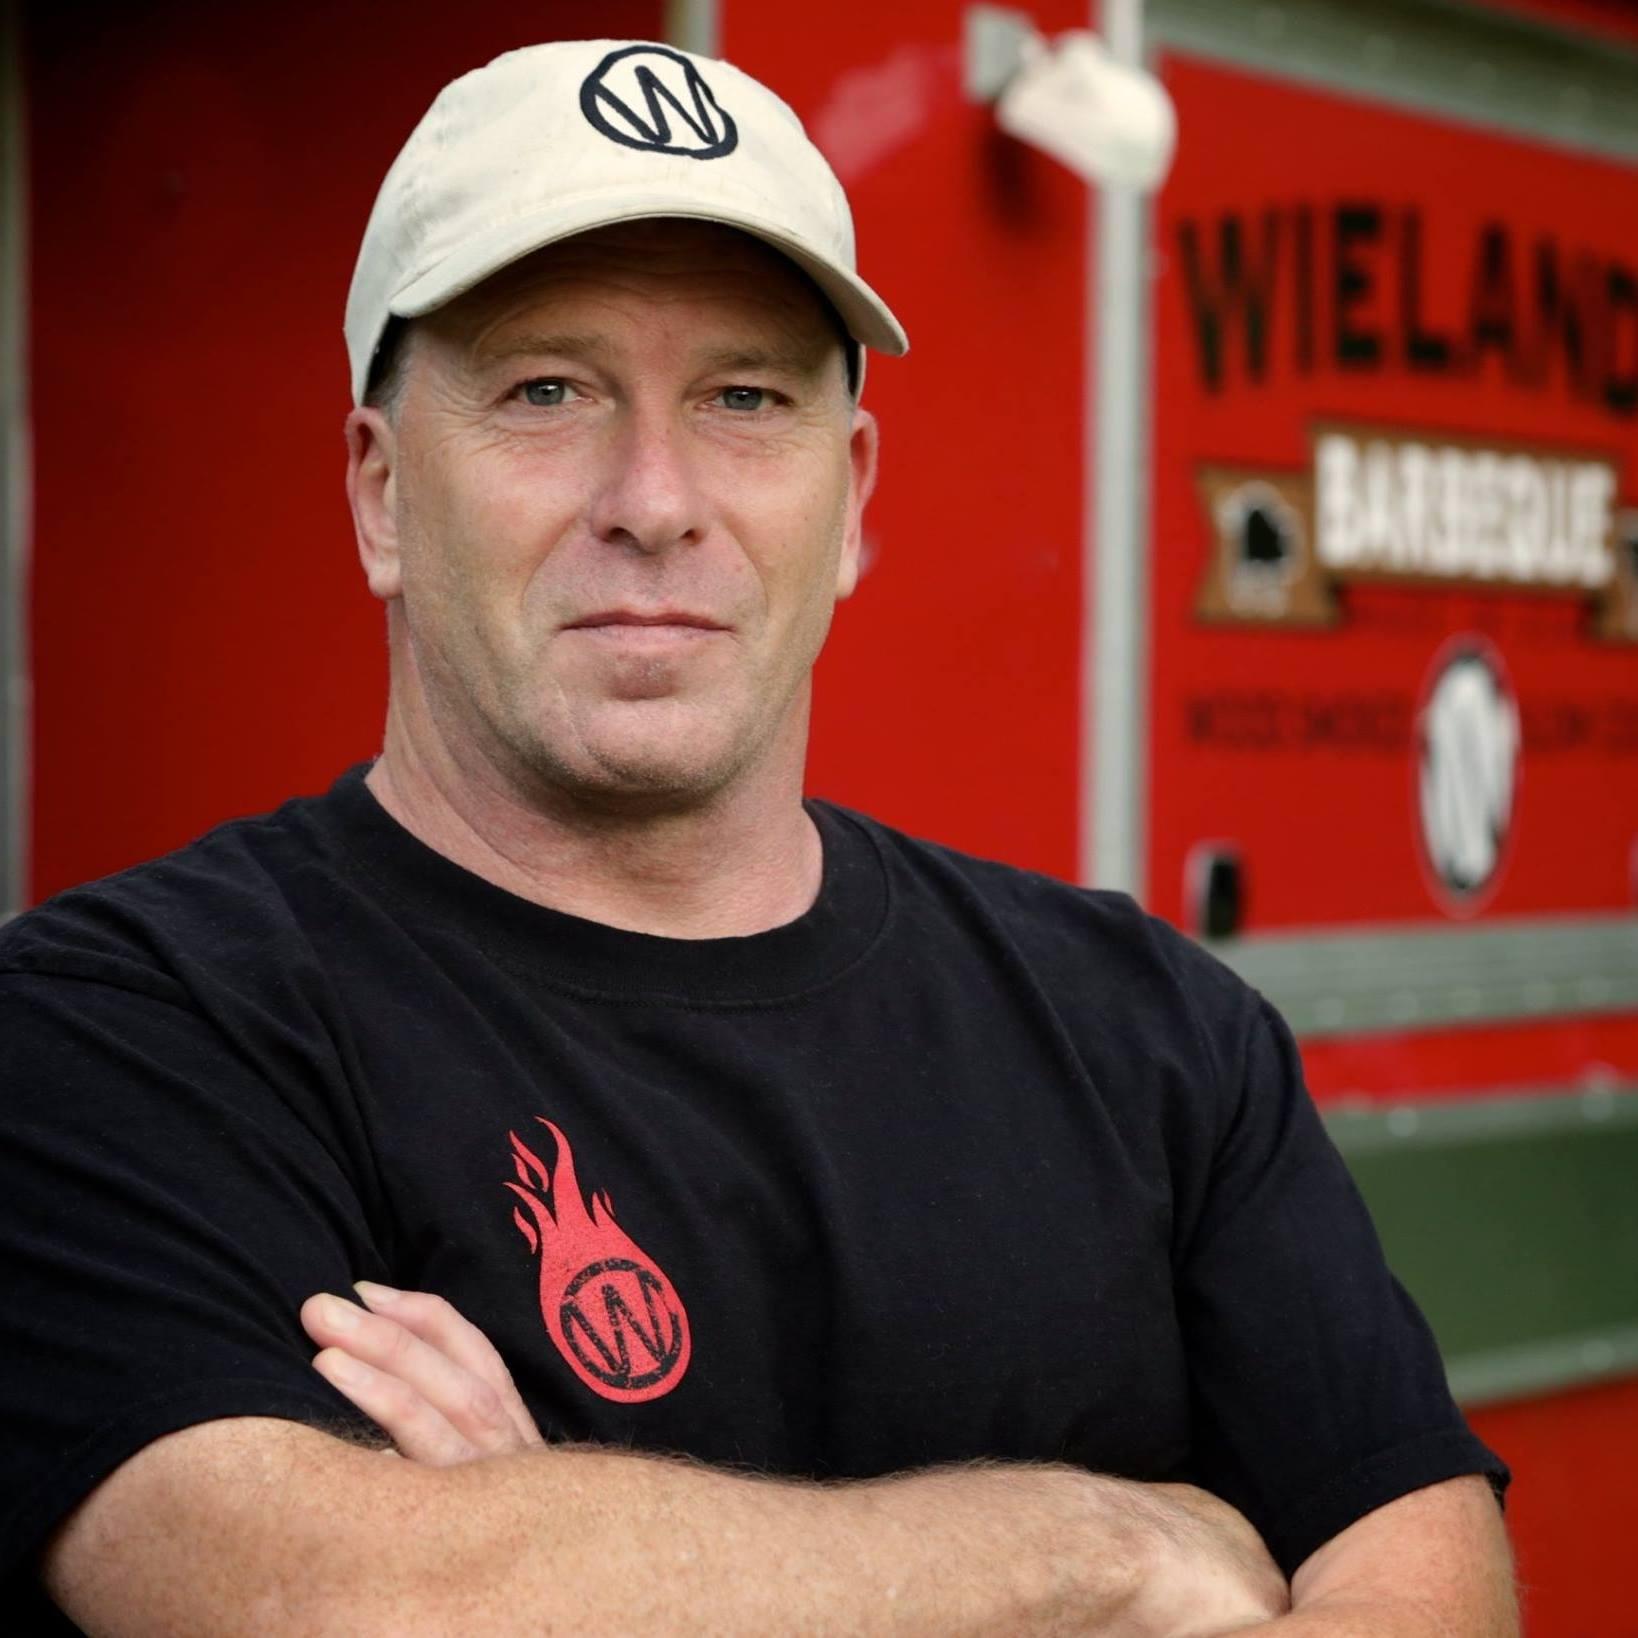 MARK WIELAND - Pit Boss